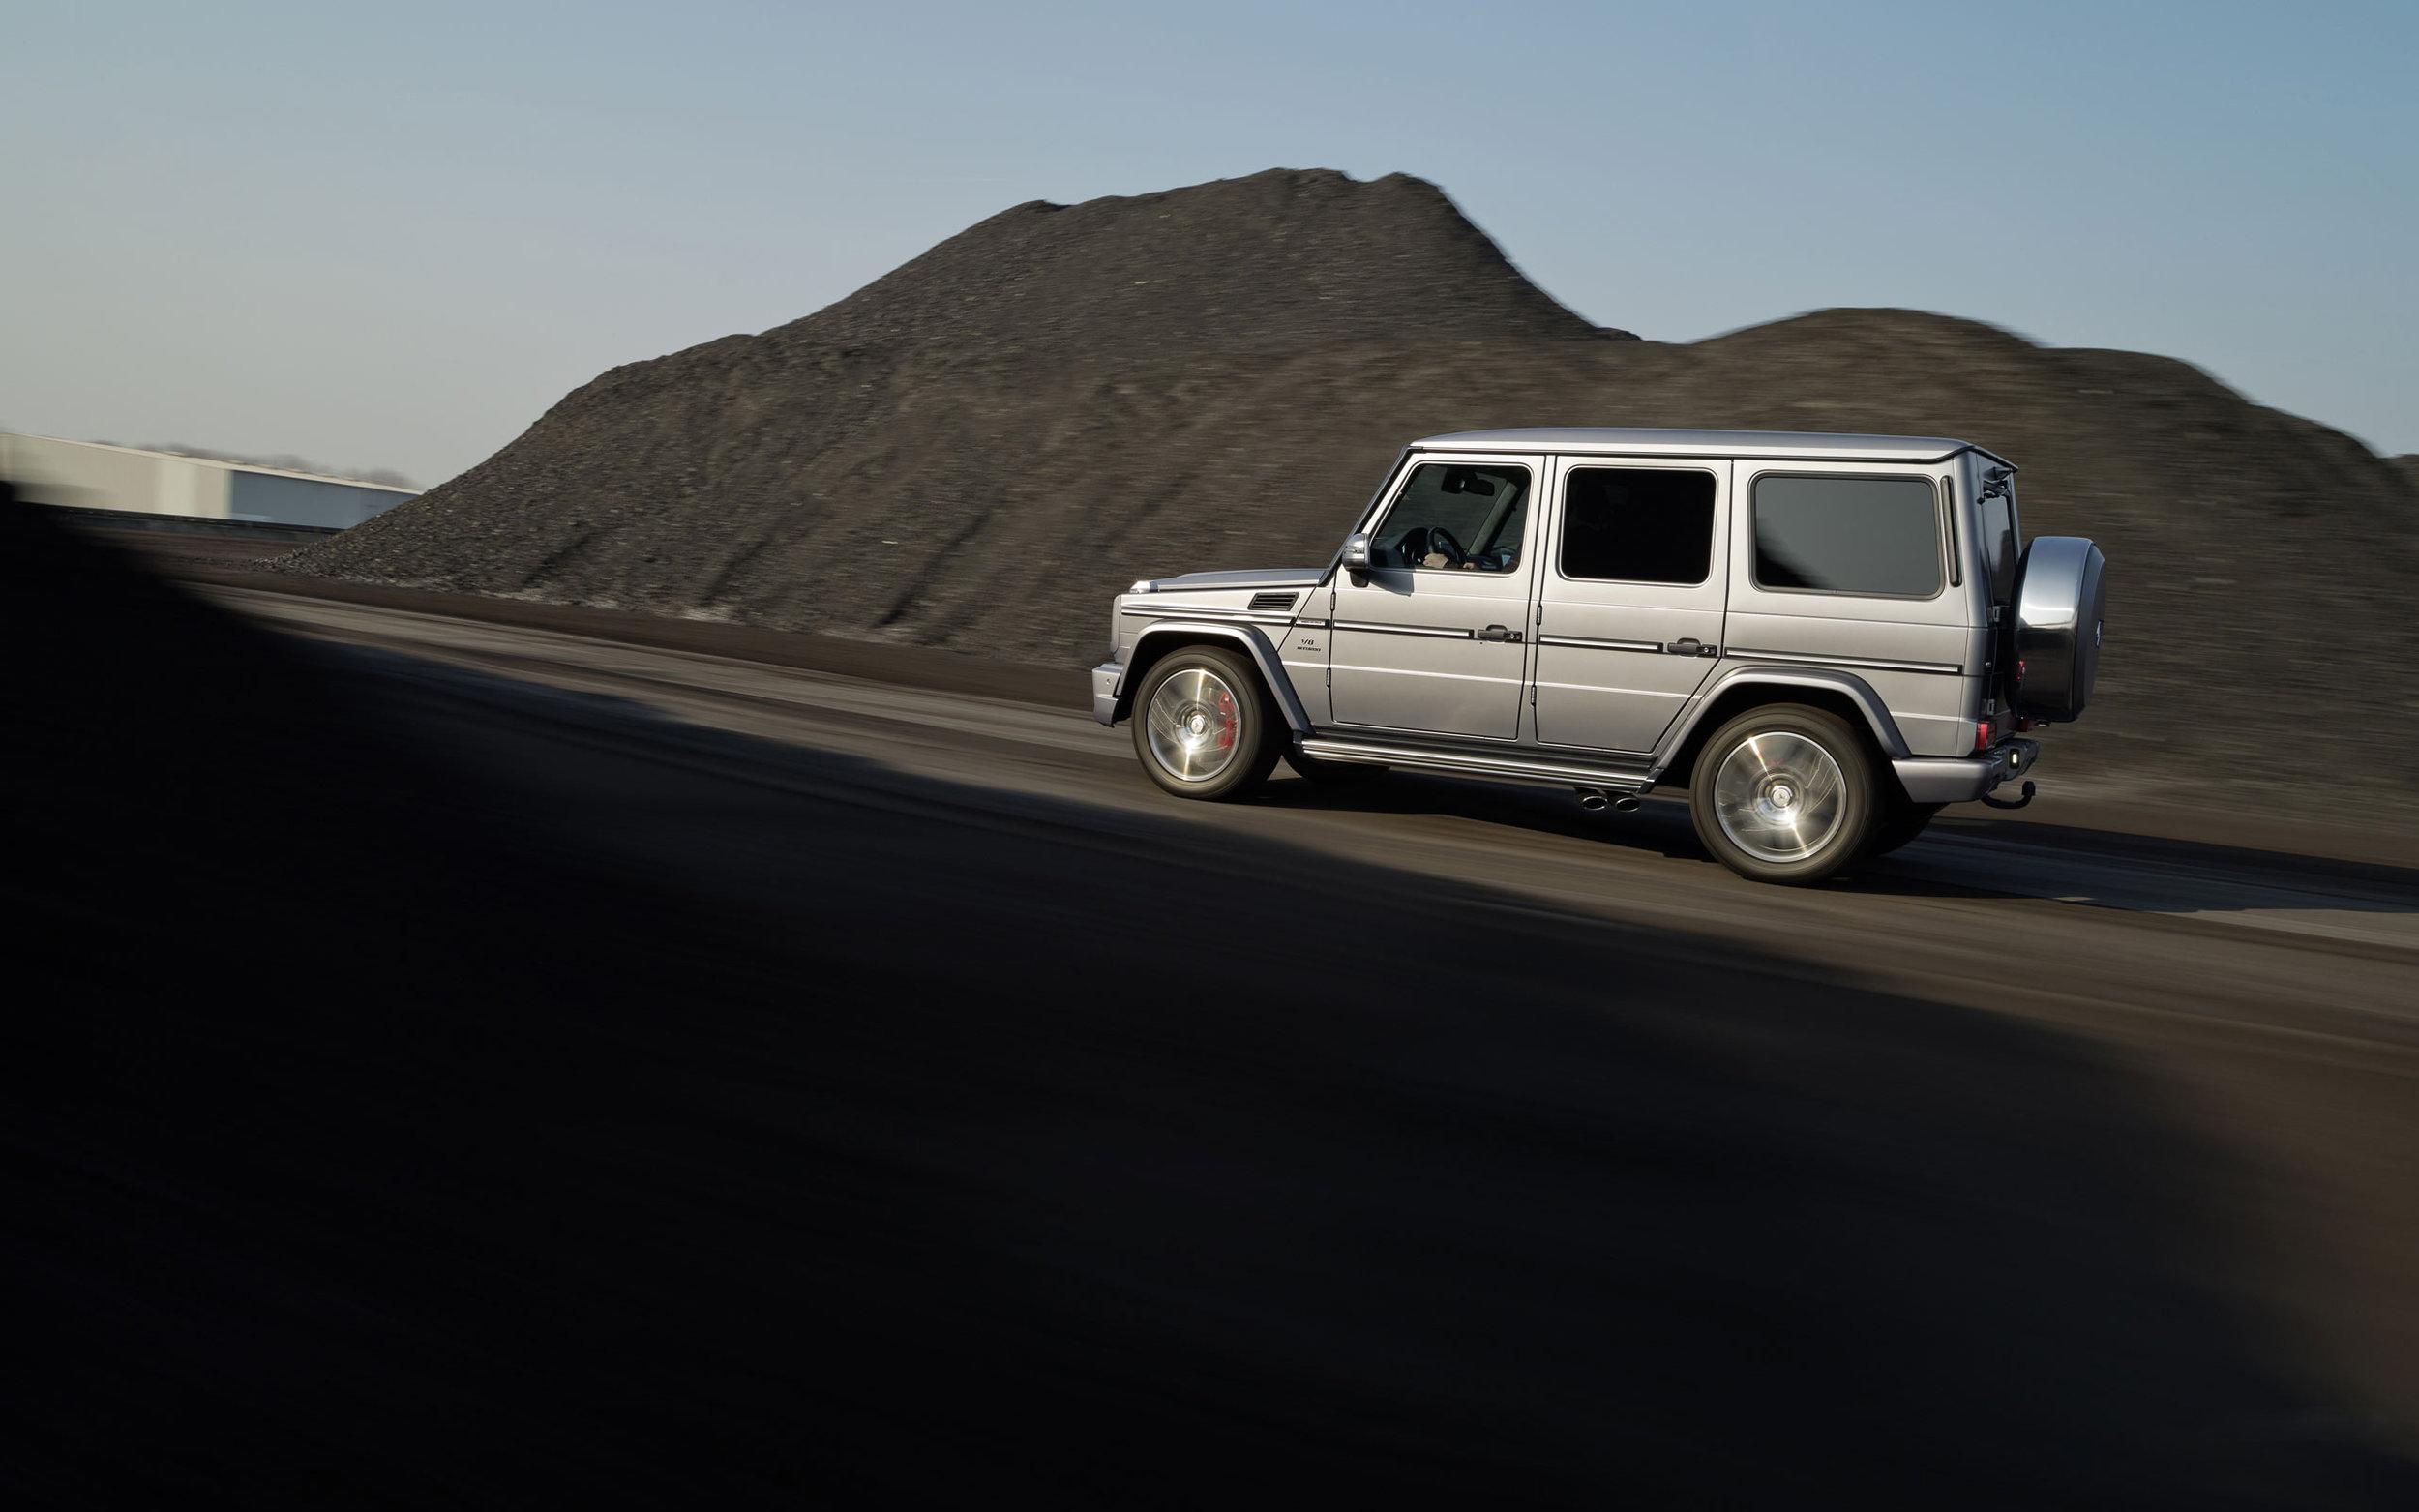 Mercedes-Benz_G_63_AMG_2012_04_2560x1600.jpg